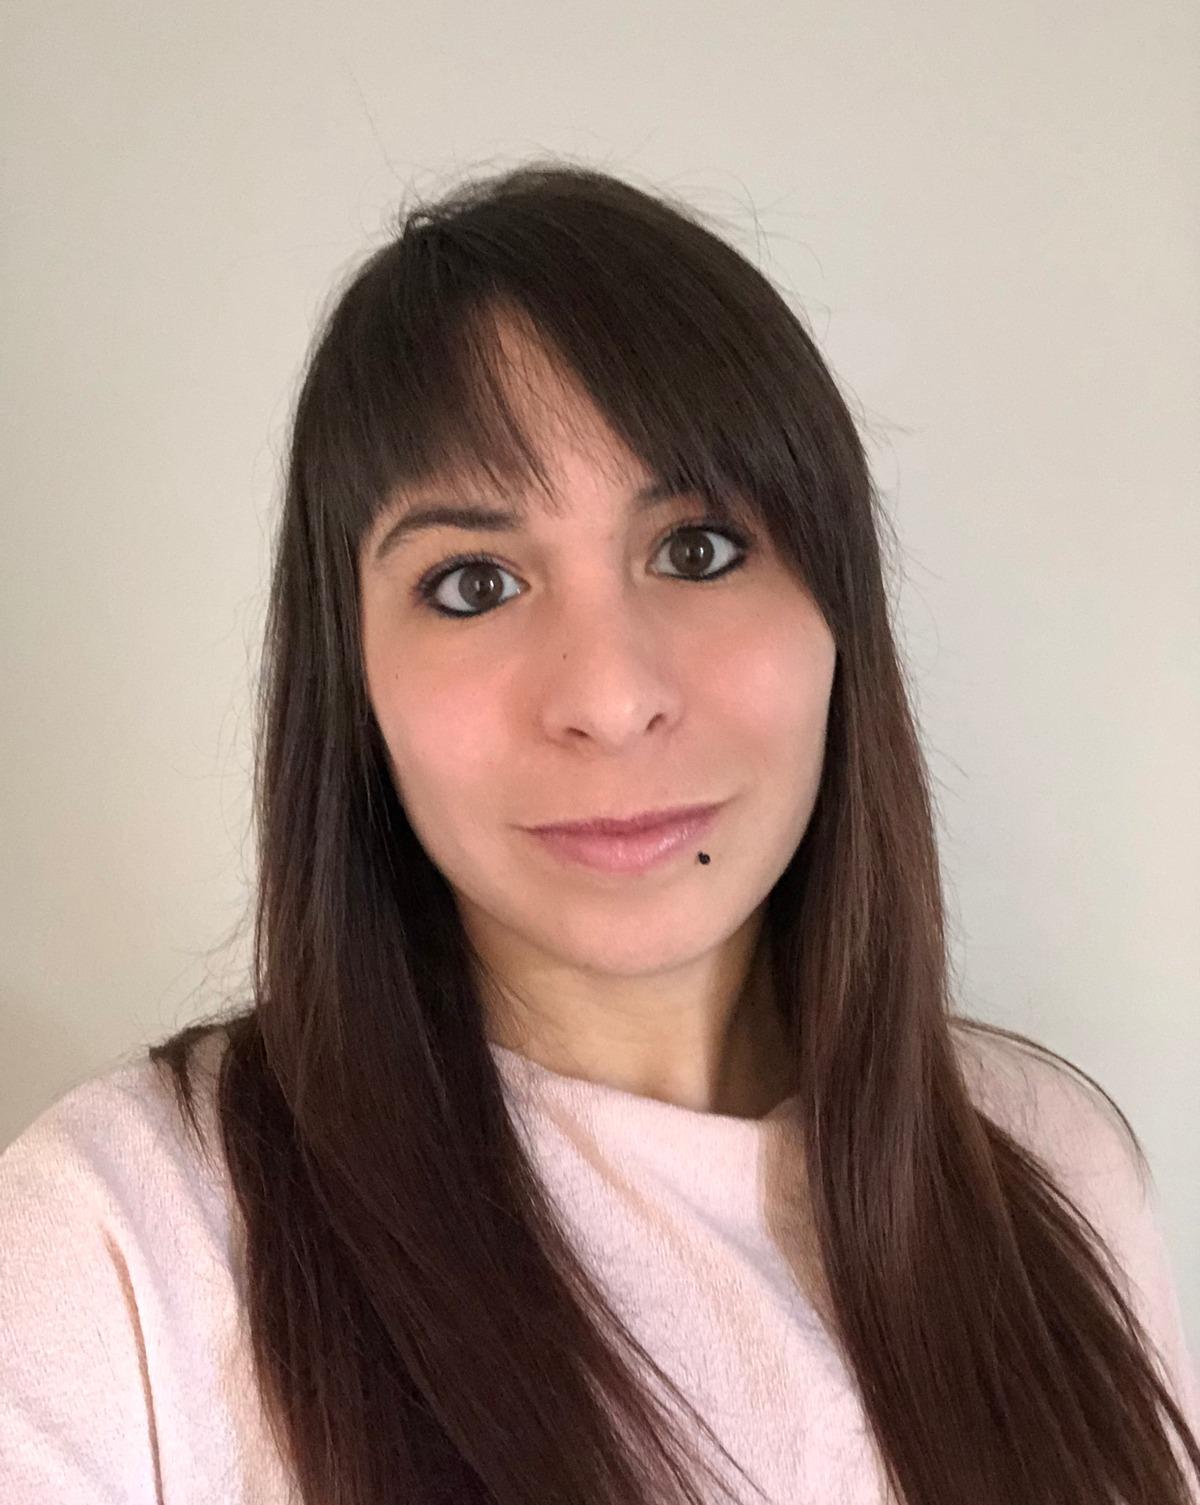 Judit Casacuberta Bago